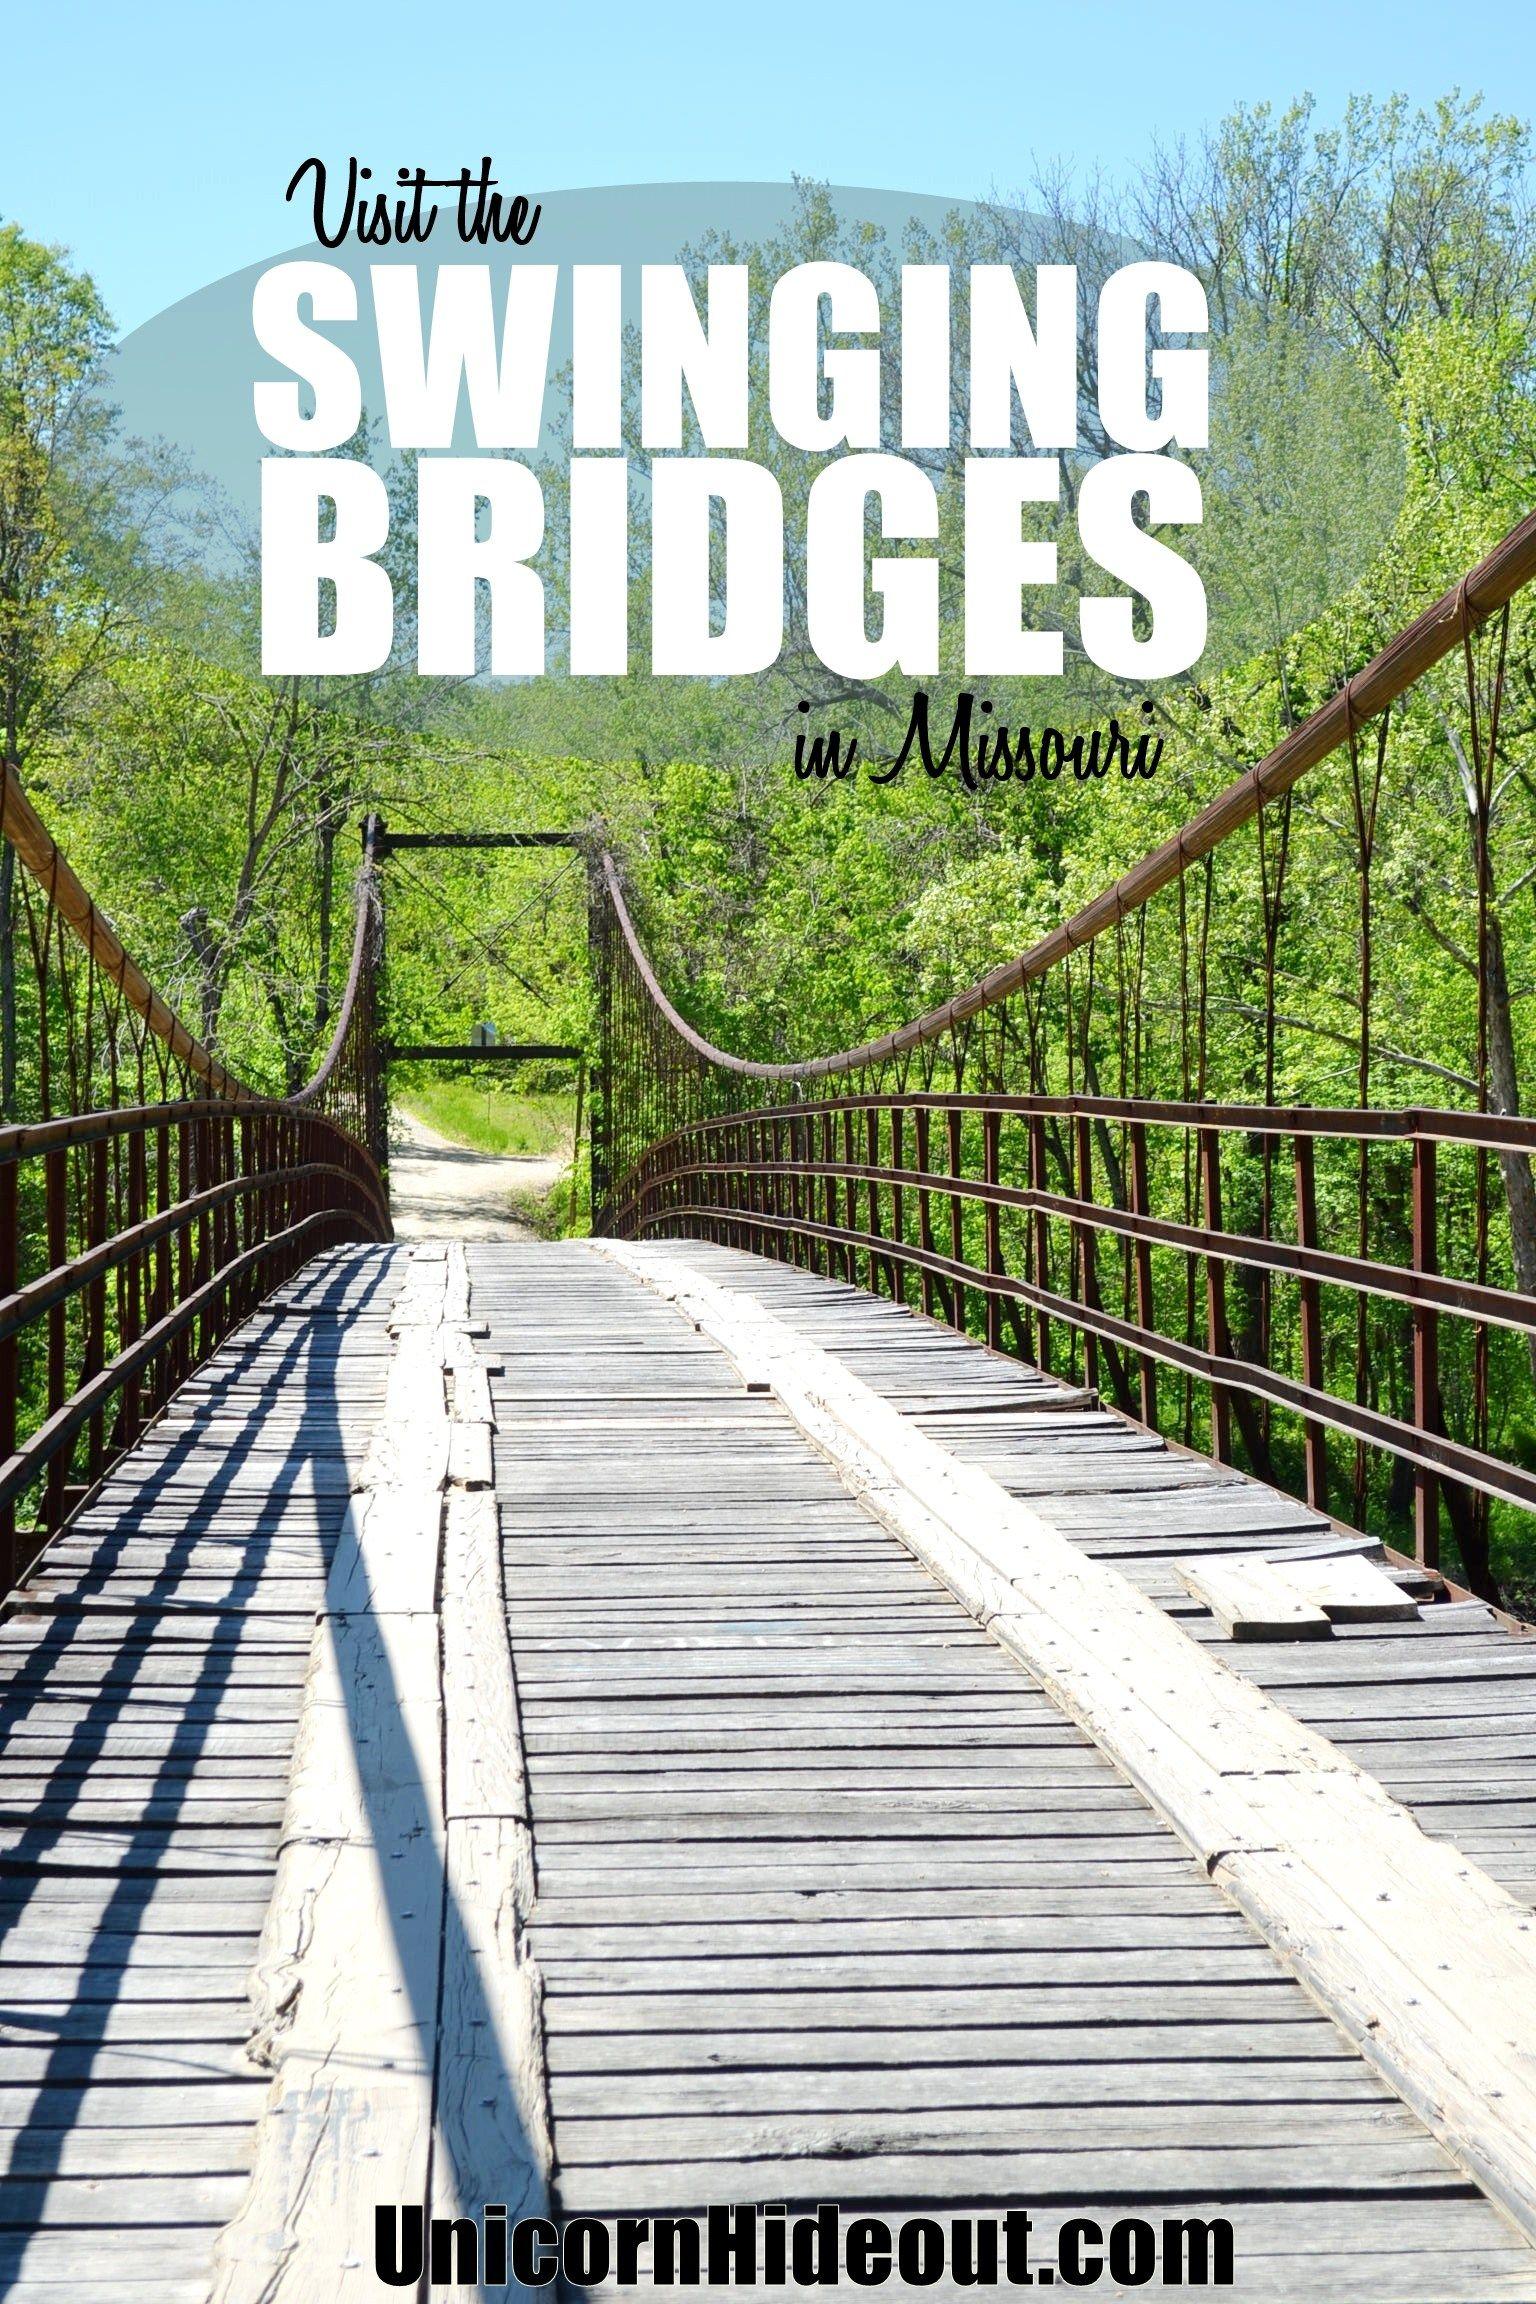 Swinging bridges of brumley